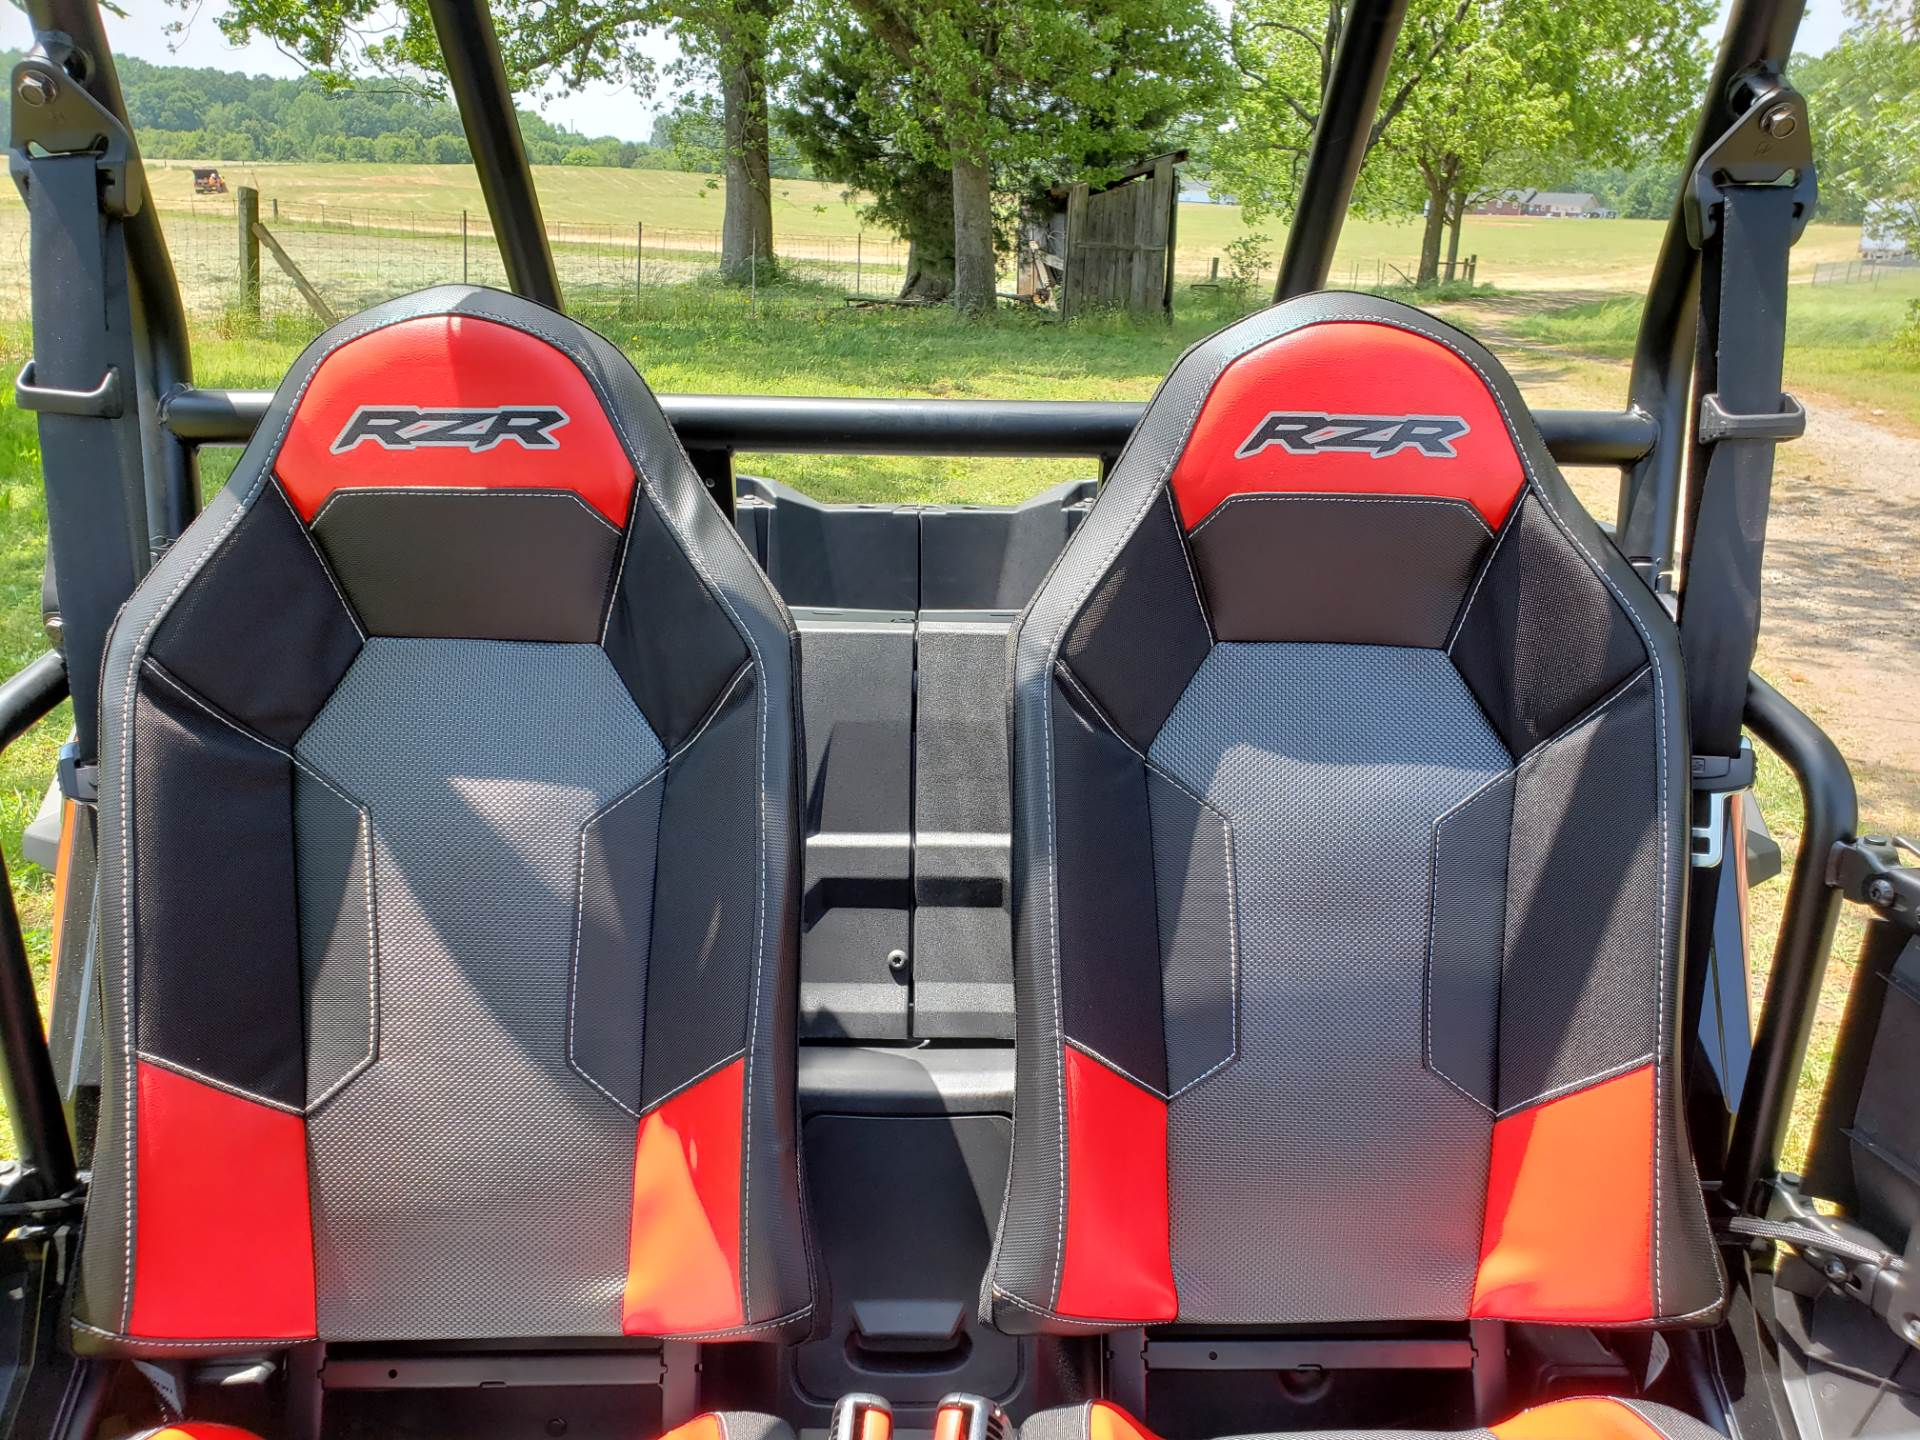 2018 Polaris RZR XP 1000 EPS Ride Command Edition 12